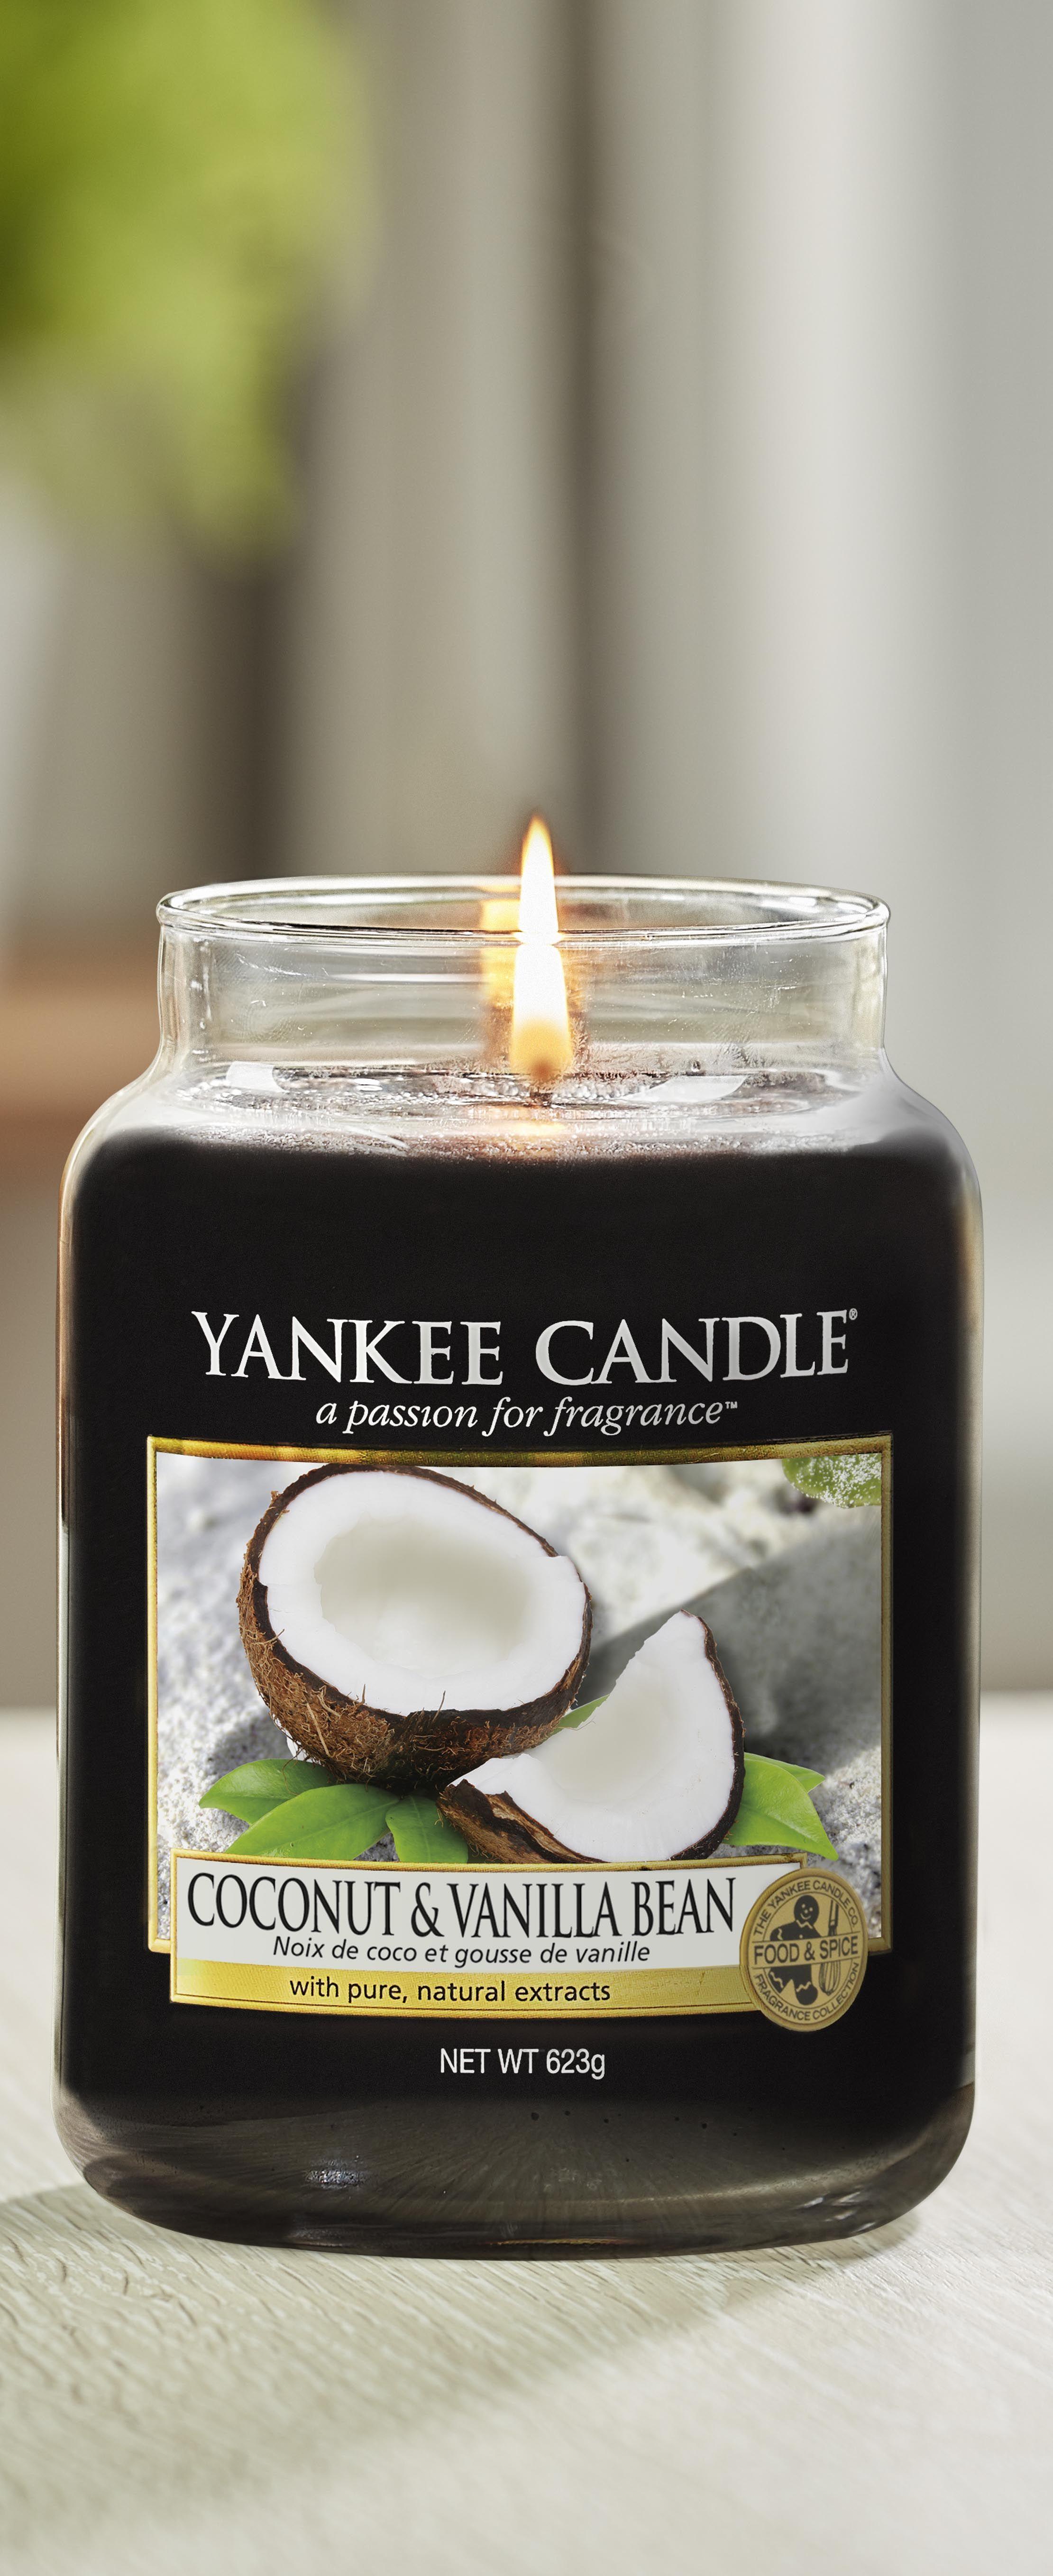 YankeeCandle | Spring/Summer | Glade candles, Candles